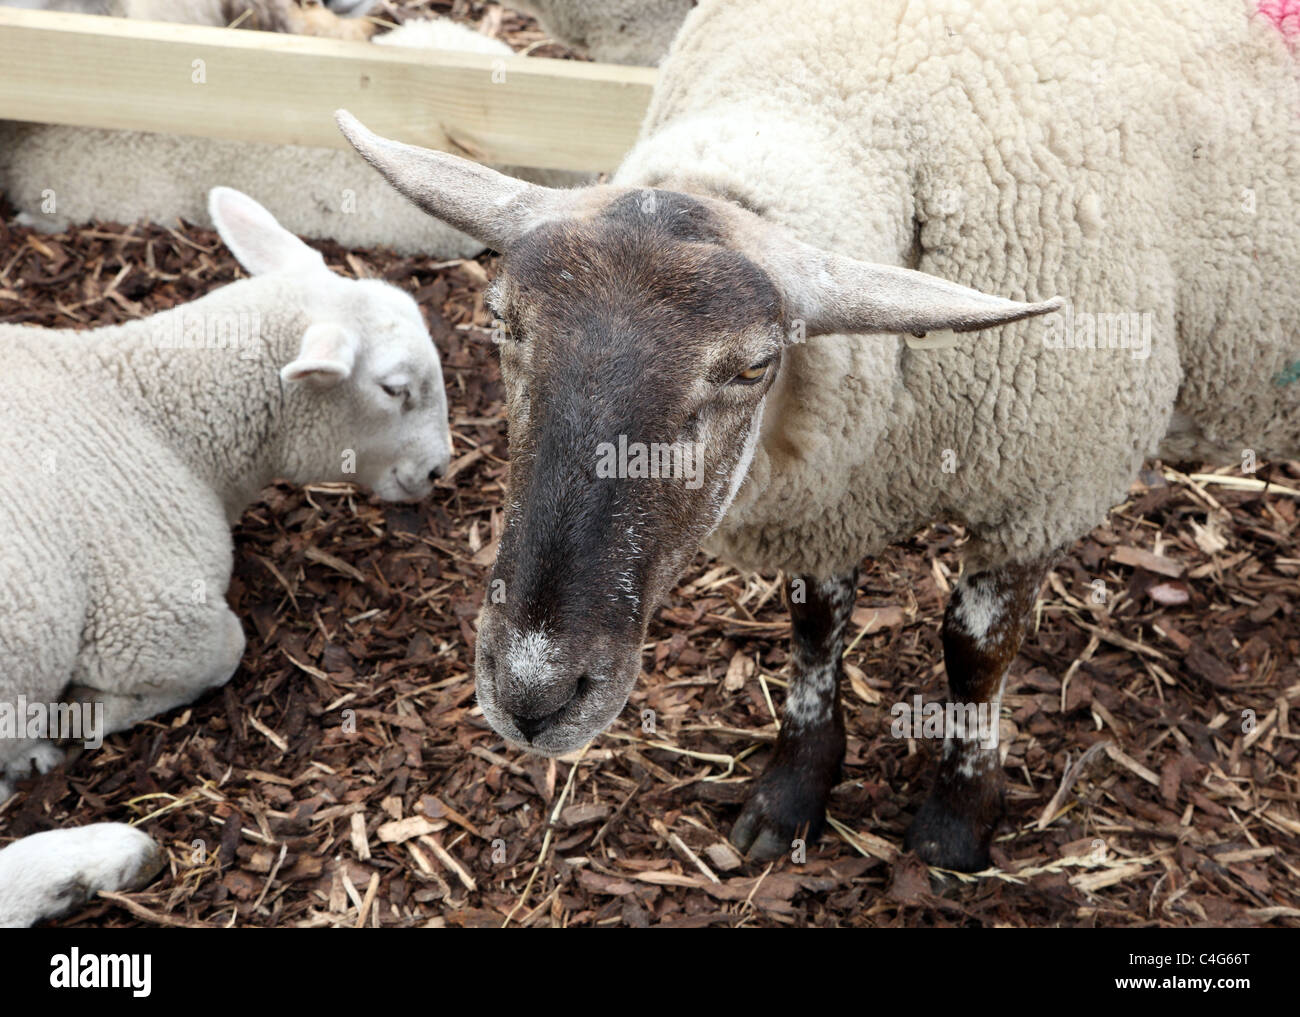 Ewe and lamb in livestock display, Bloom garden festival, Dublin - Stock Image